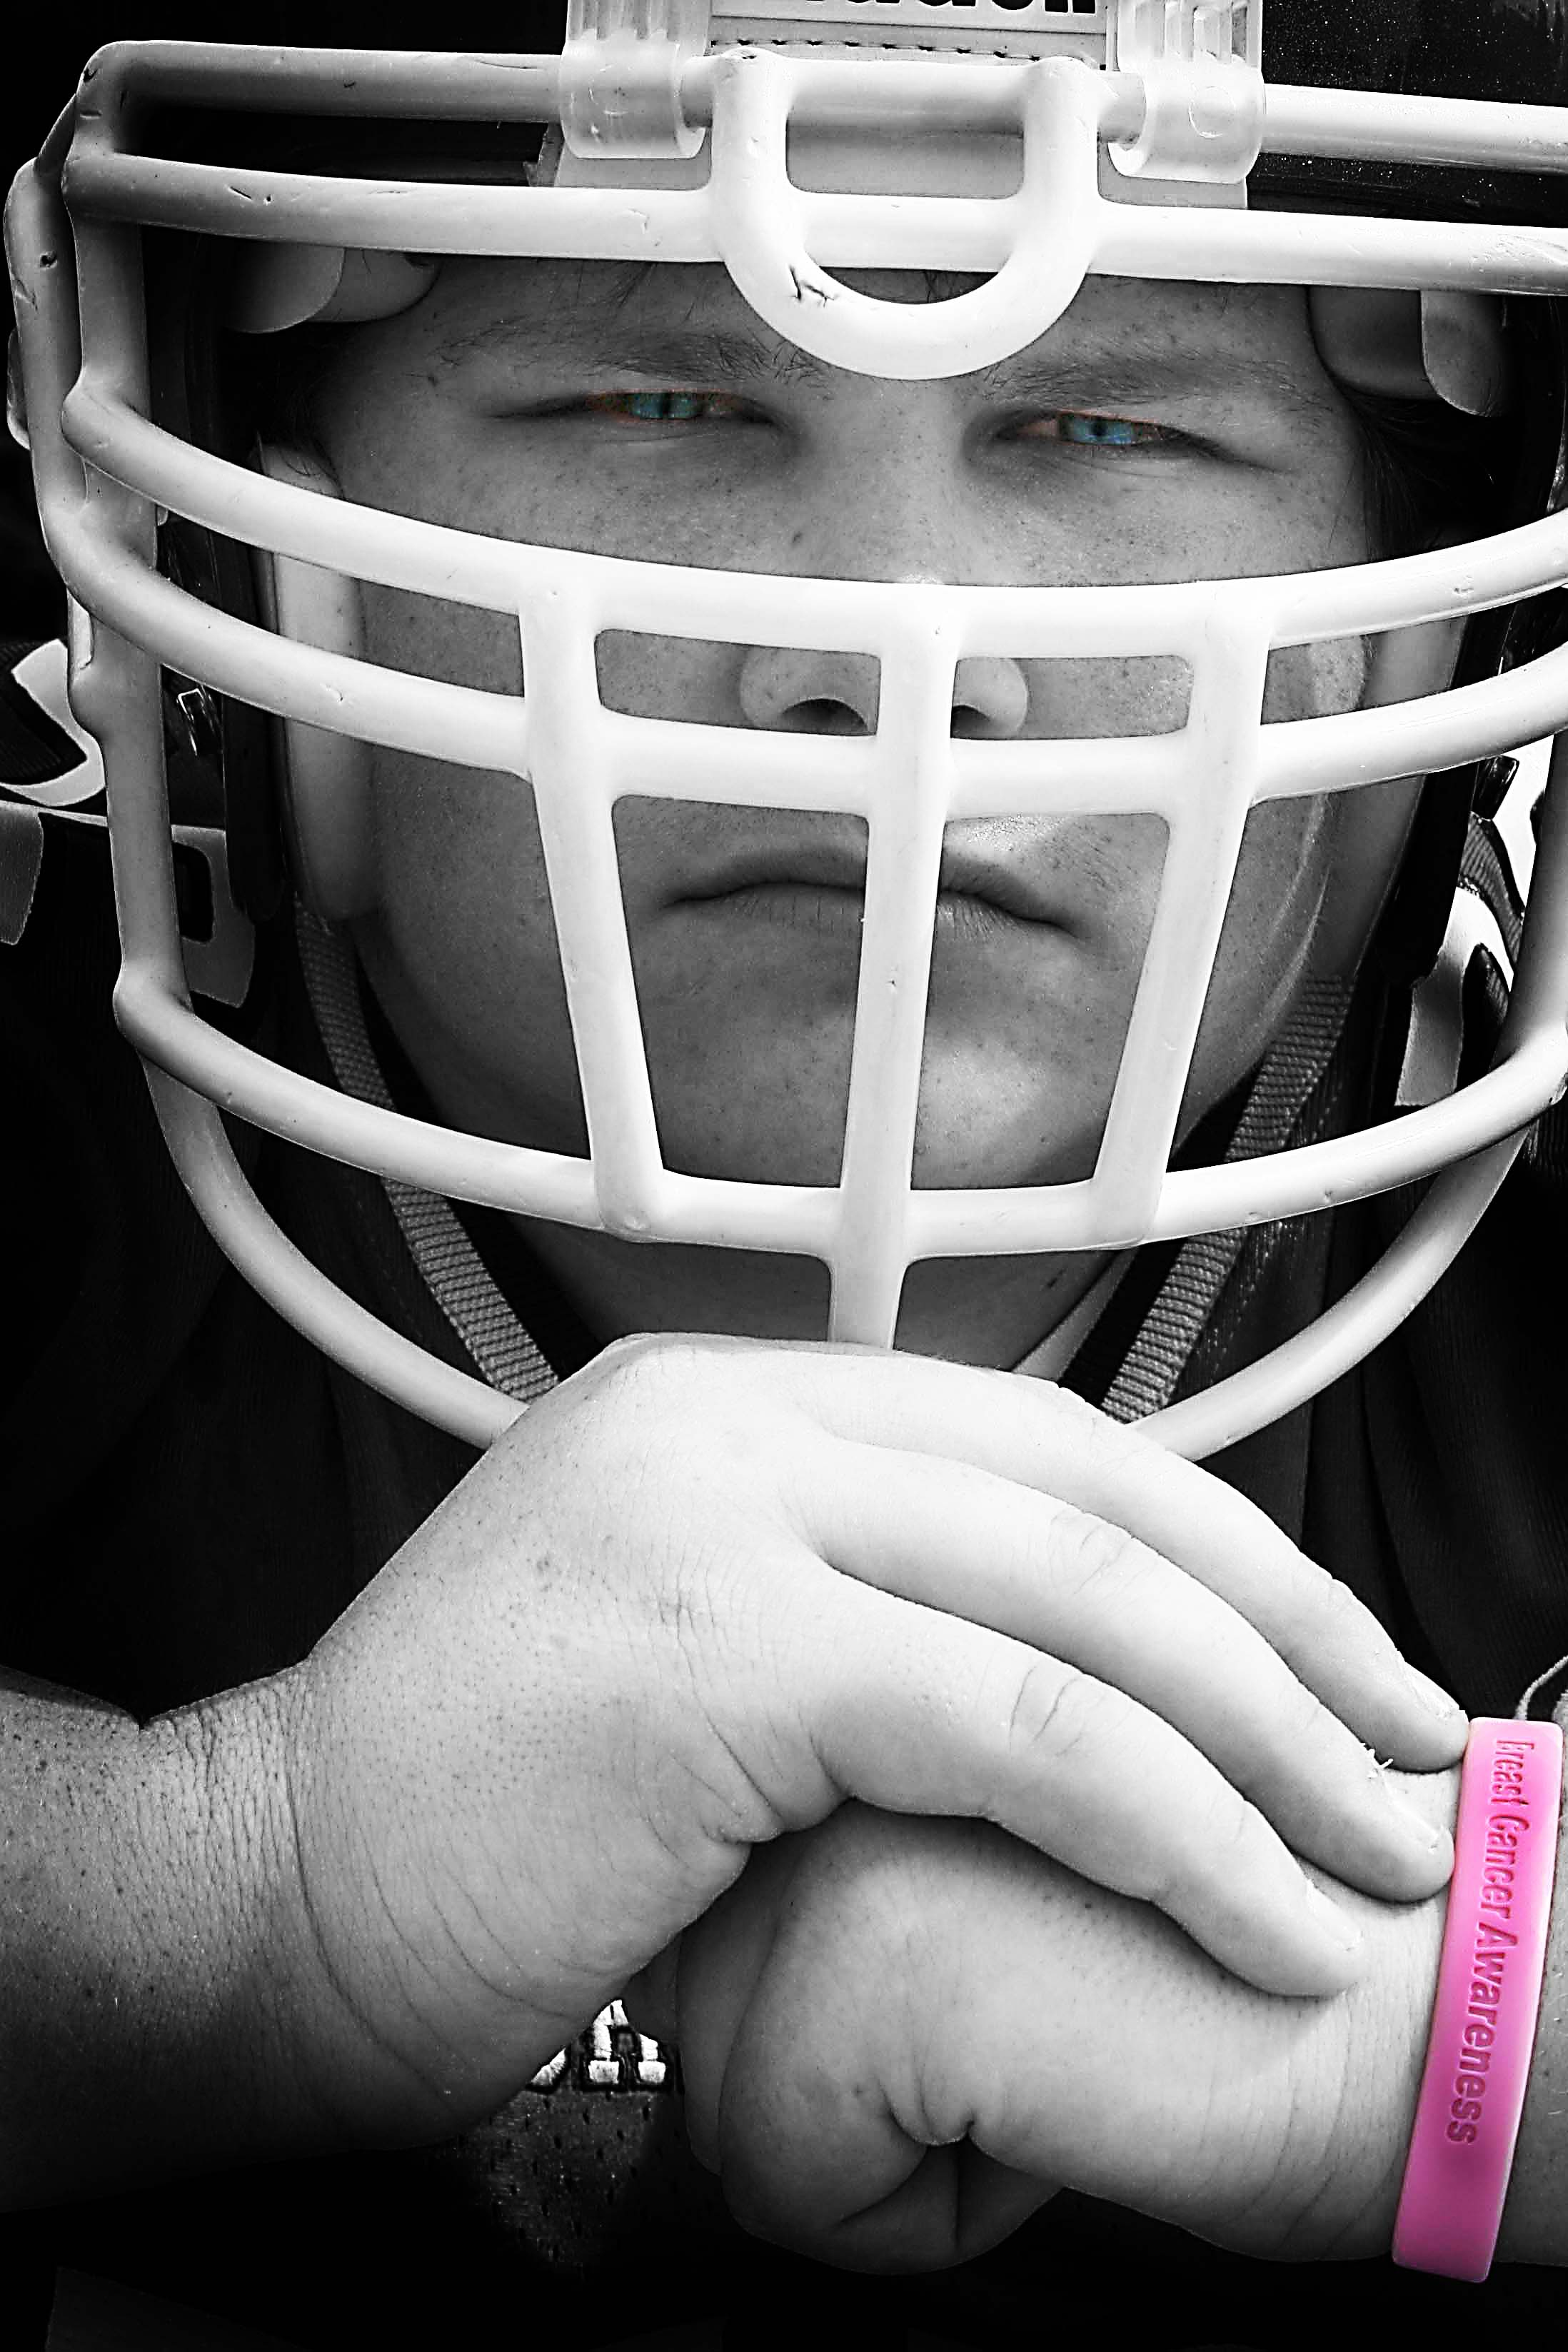 Nick helmet pink bracelet bw.jpg